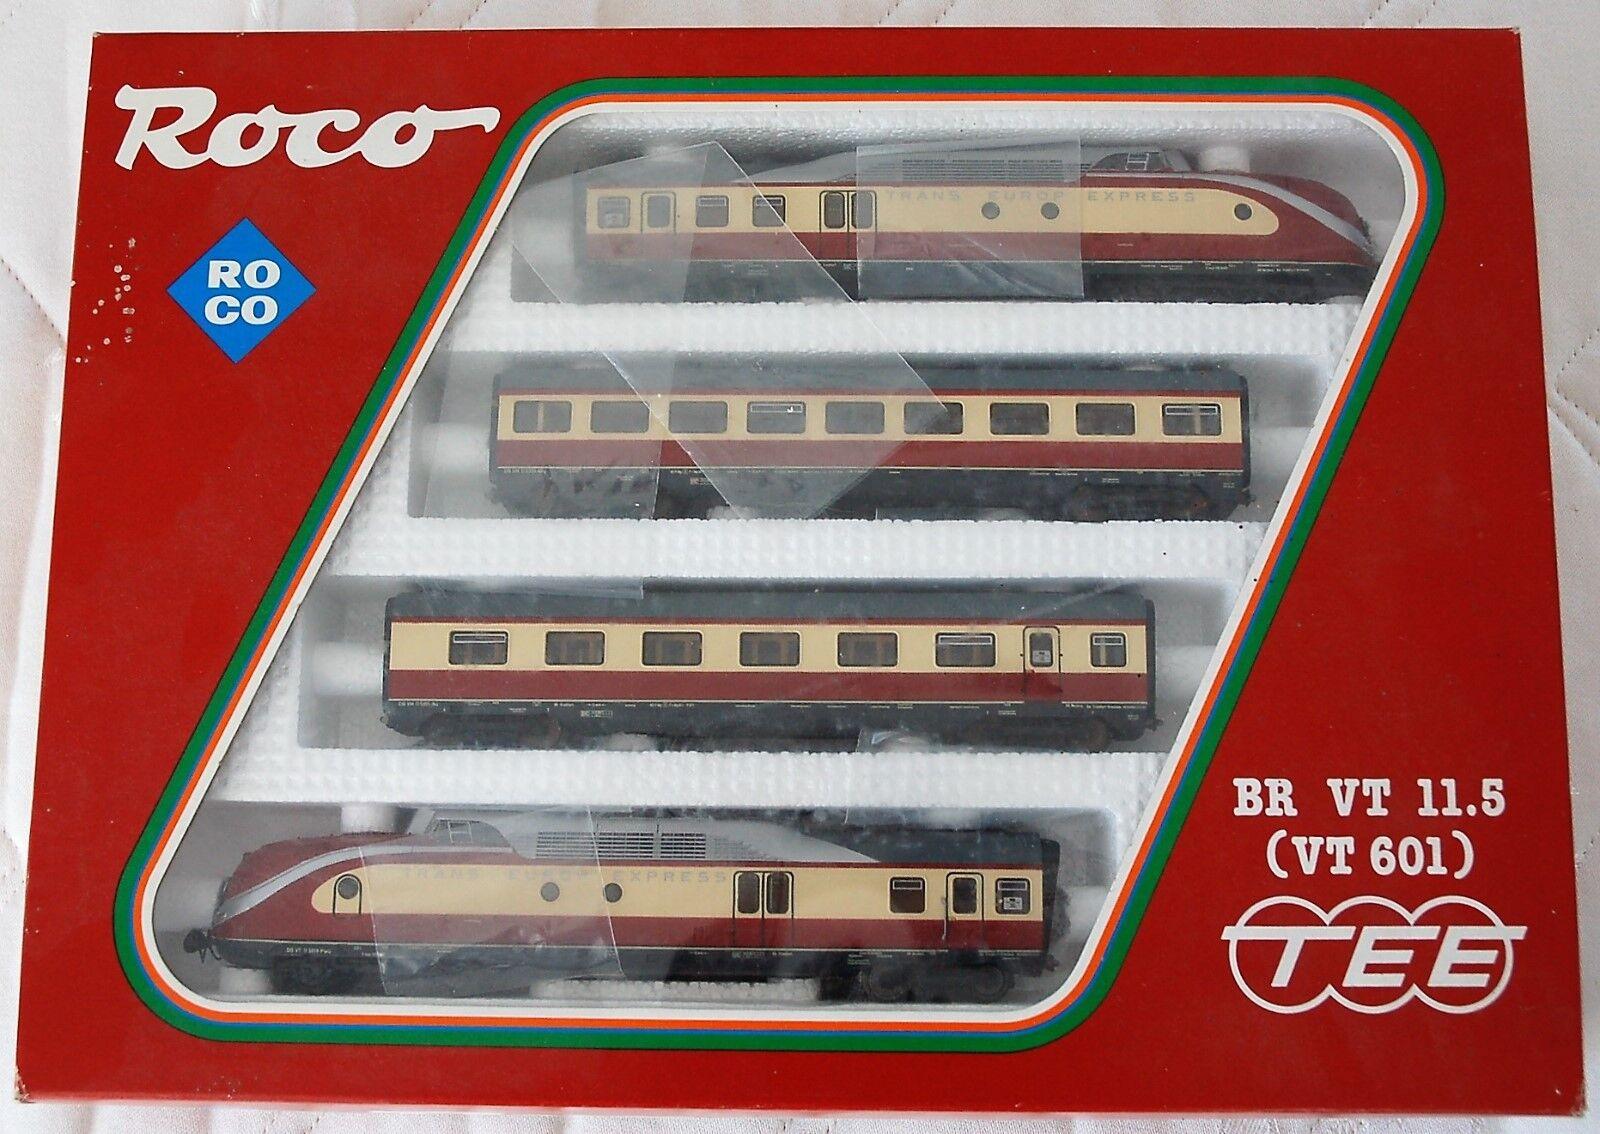 ROCO 43011 TEE-Triebzug VT11.5 BR 601 der DB, Wechselstrom, TOP TOP TOP & OVP    Günstig  0a4842